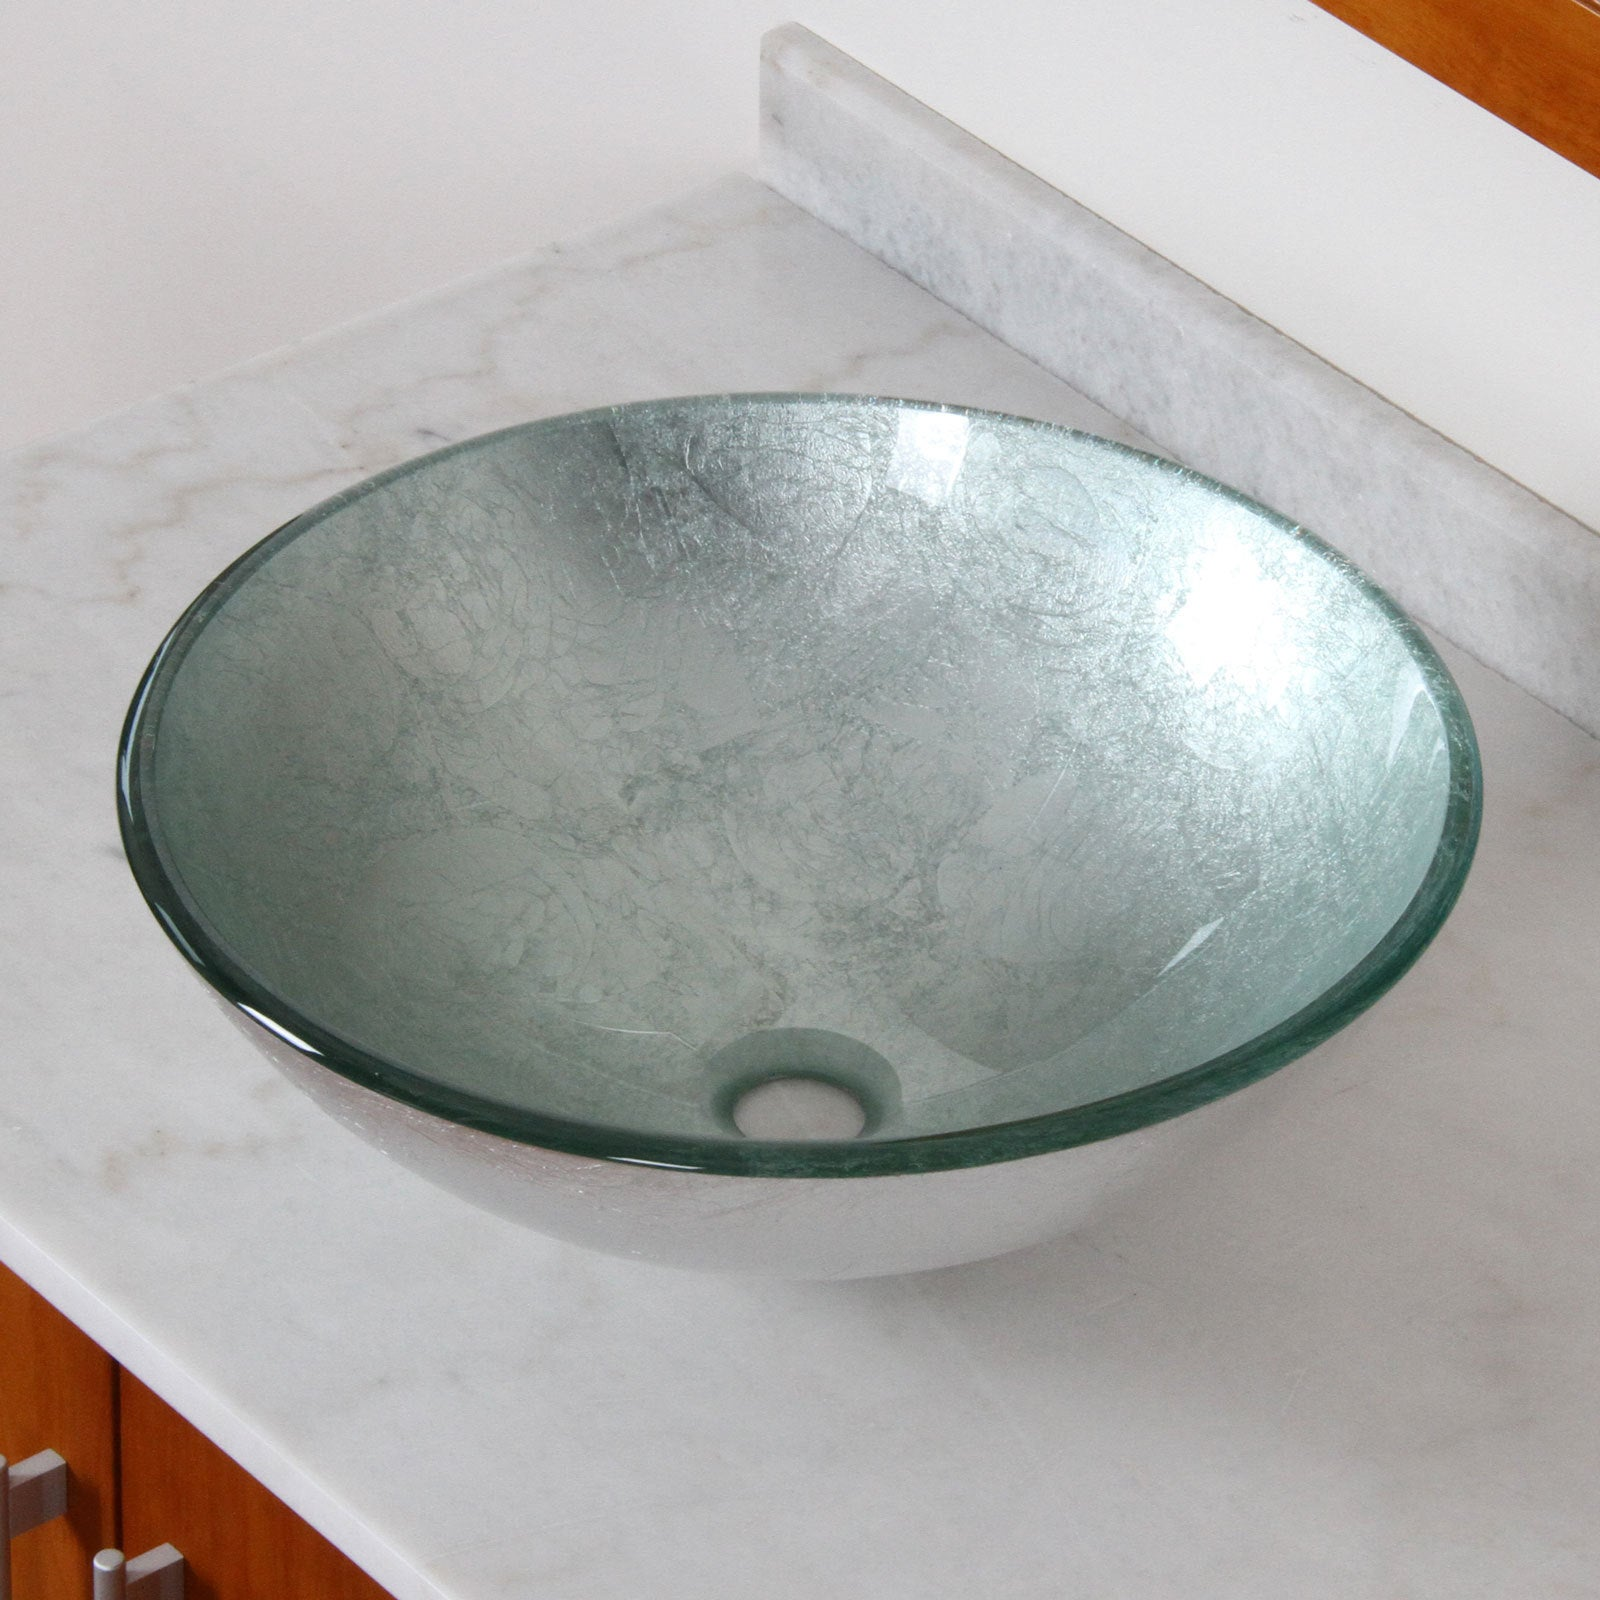 Elite Modern Tempered Glass Bathroom Vessel Sink with Silver ...